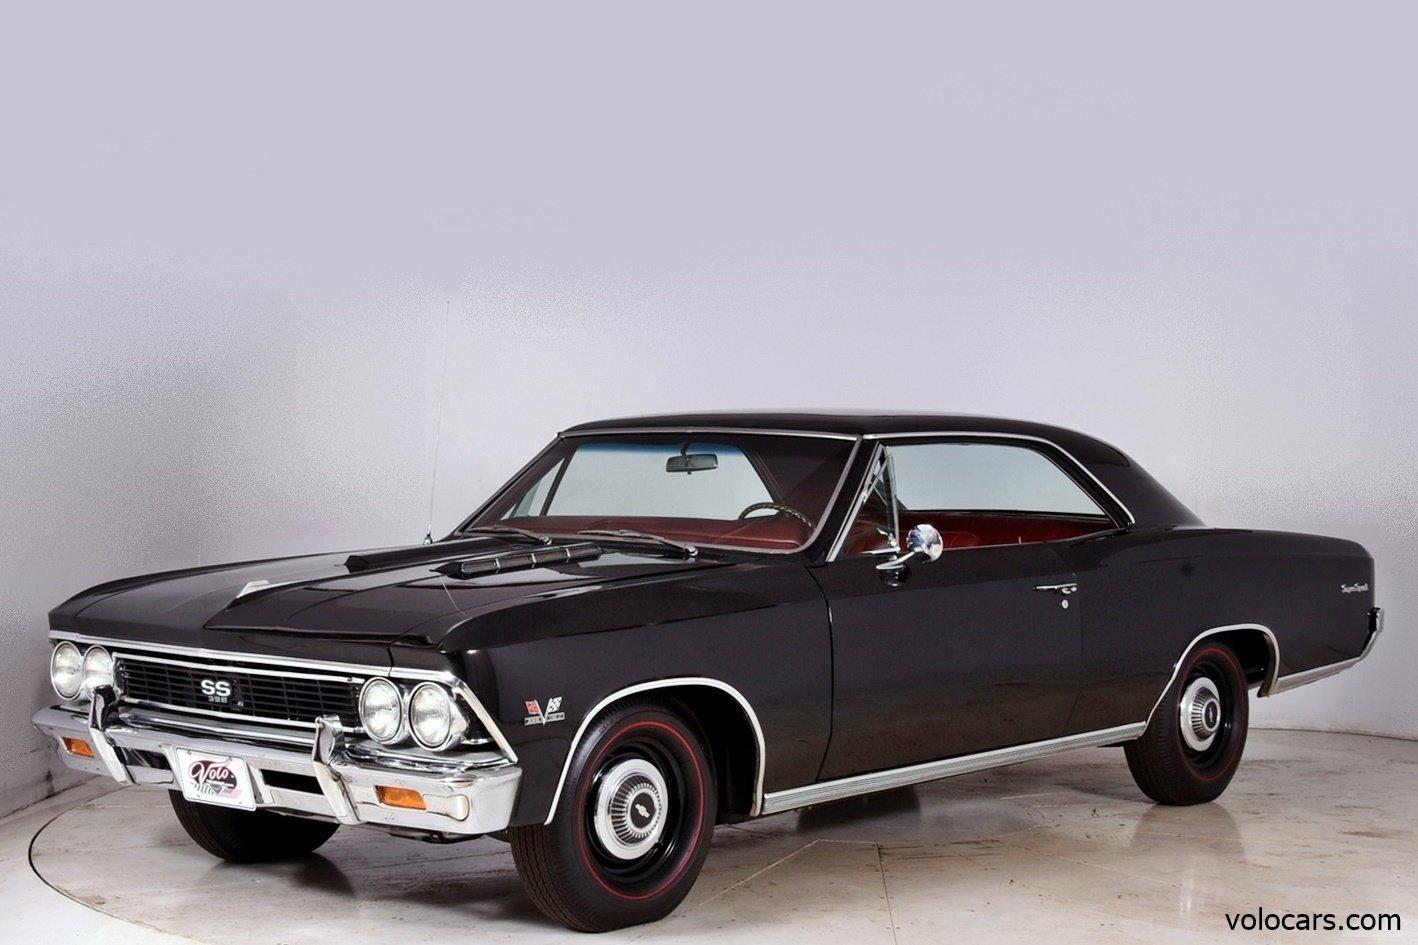 1966 Chevrolet Chevelle Ss 396 For Sale 73262 Mcg